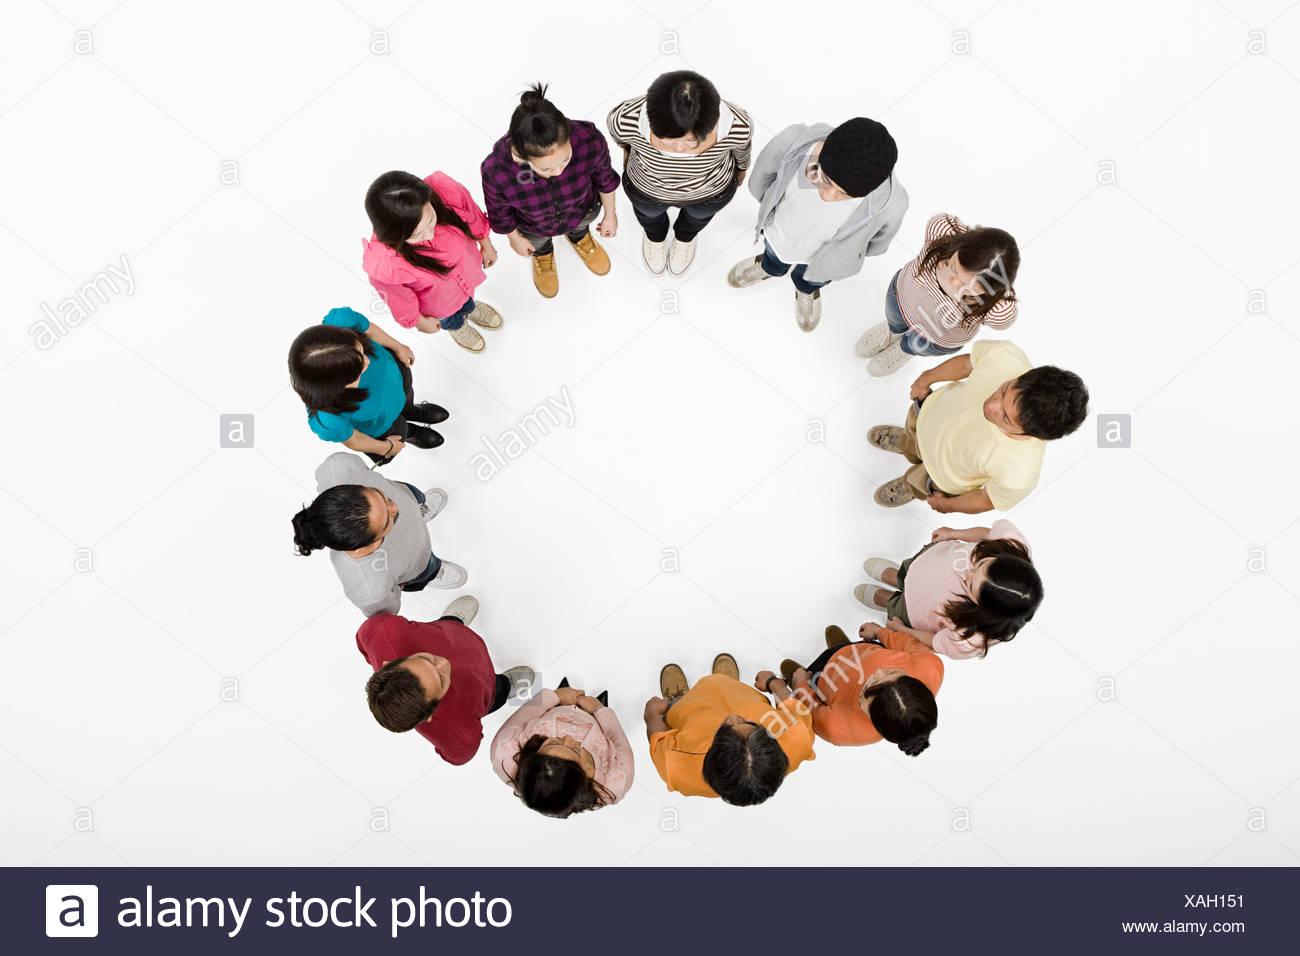 Menschen im Kreis Stockbild